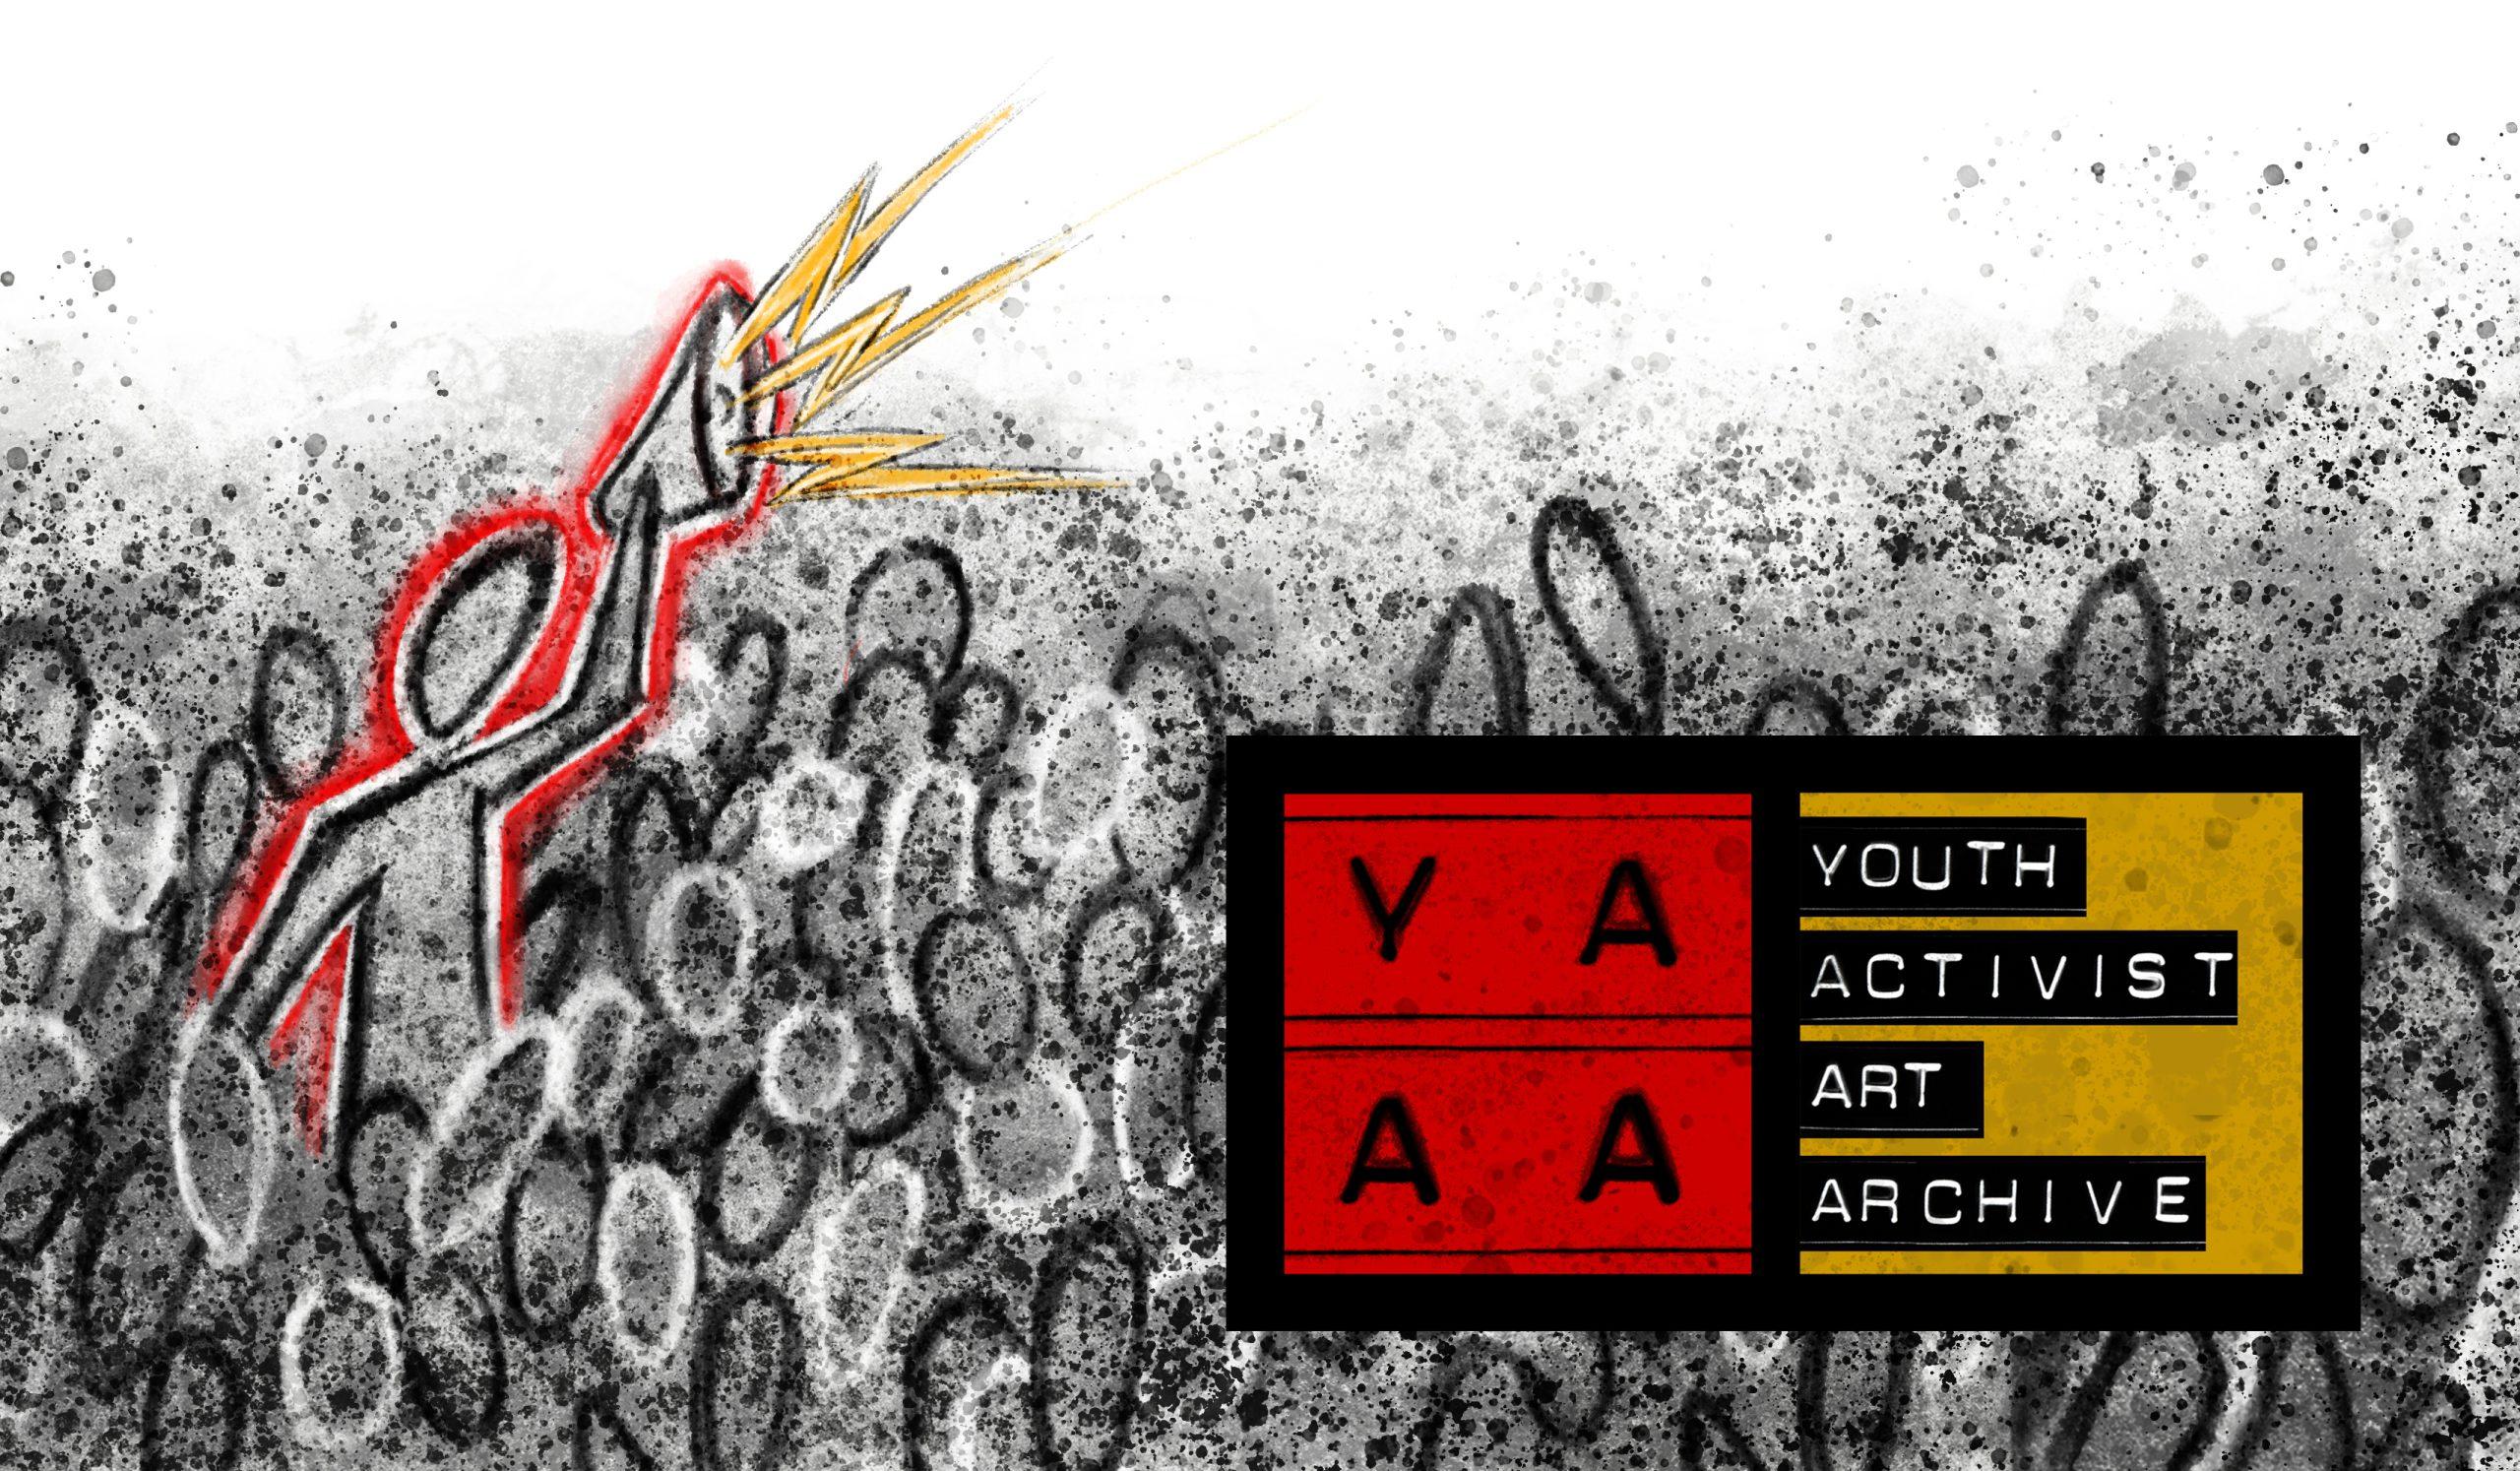 Youth Activist Art Archive